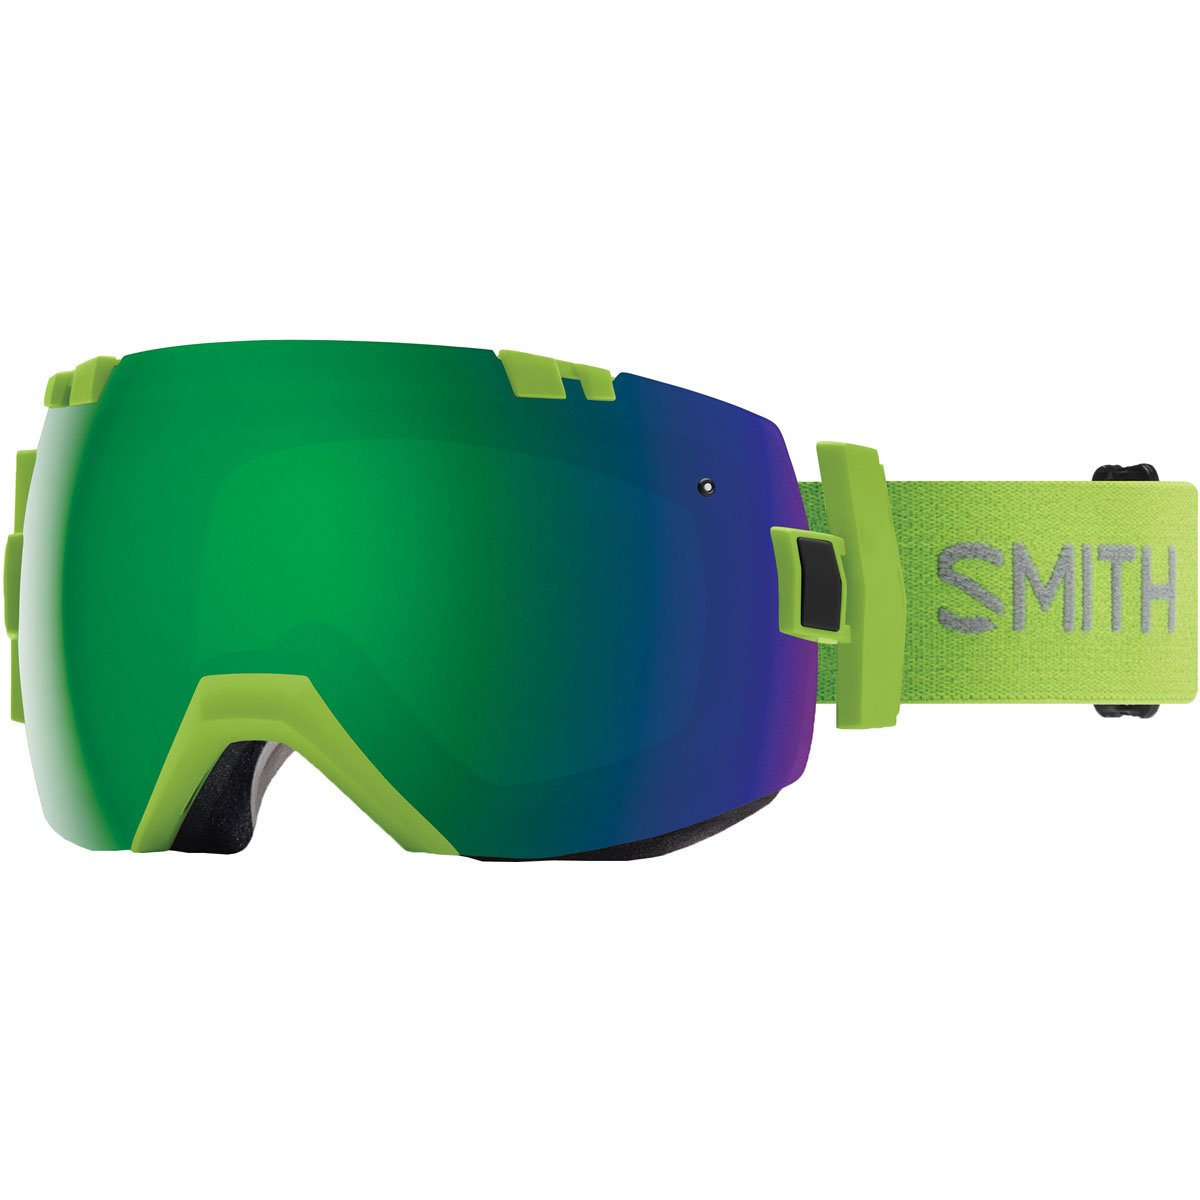 Smith Optics I/Ox - Asian Fit Adult Snow Goggles - Flash/Chromapop Sun Green Mirror